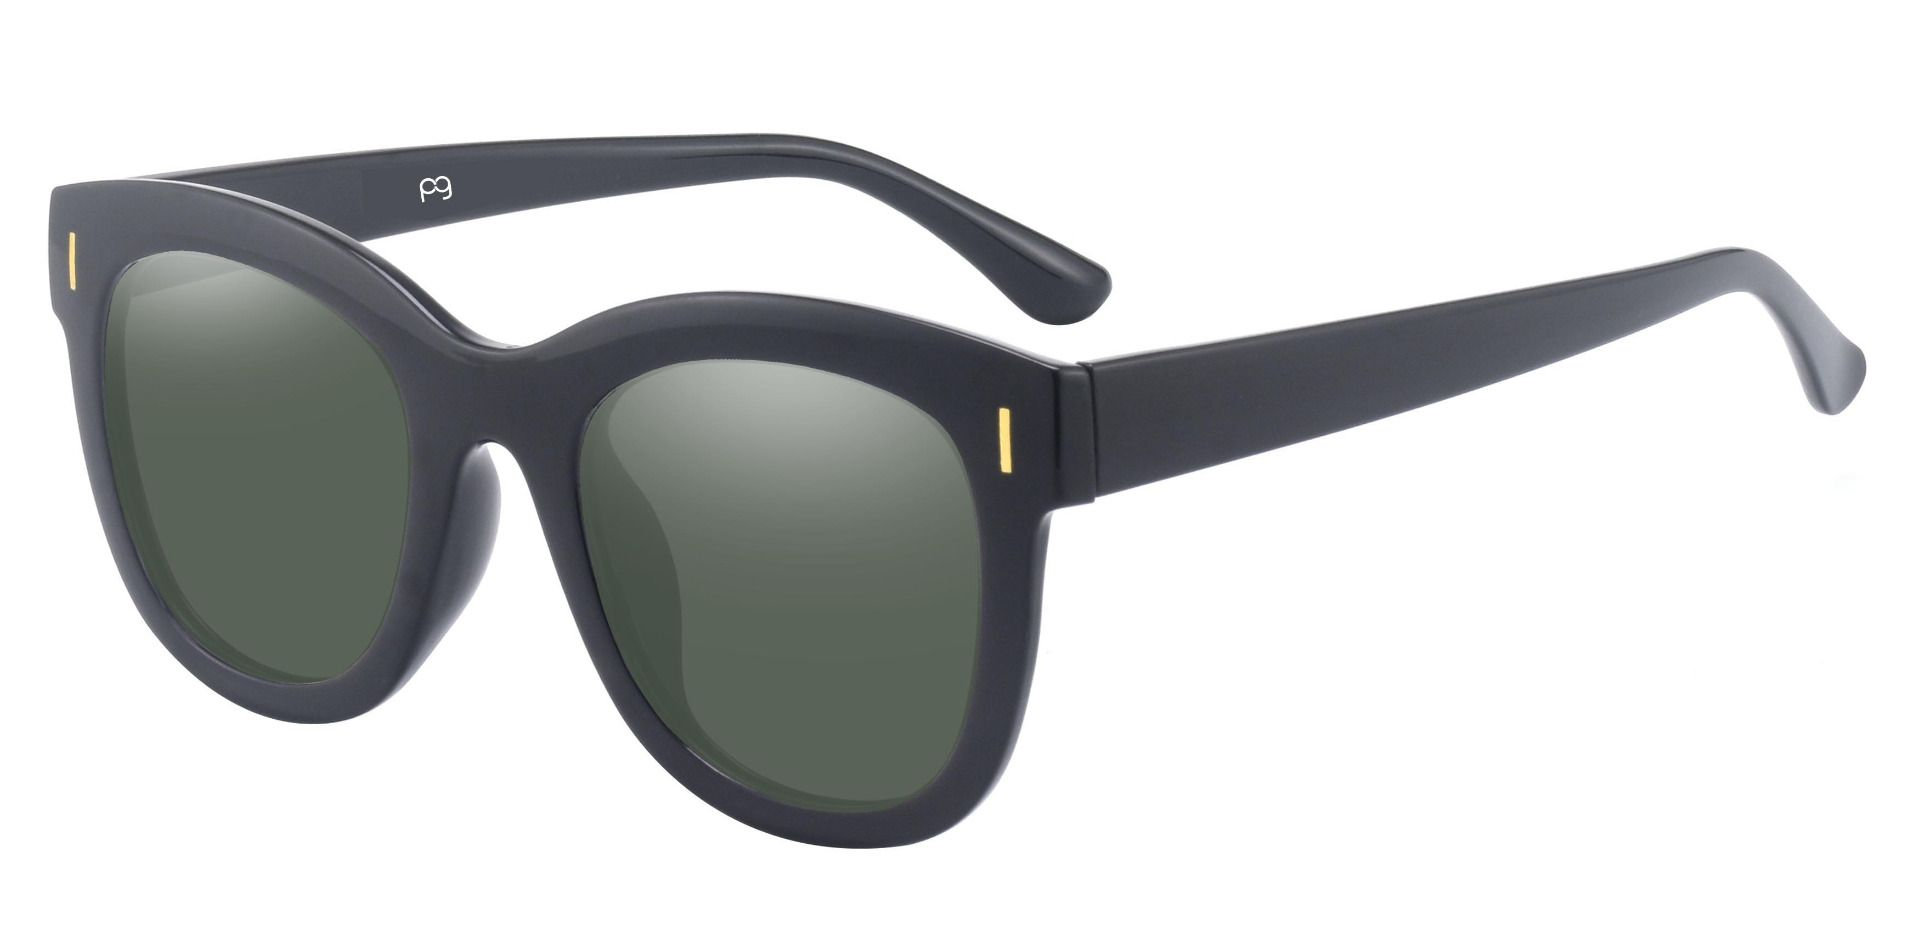 Saratoga Square Progressive Sunglasses - Black Frame With Green Lenses